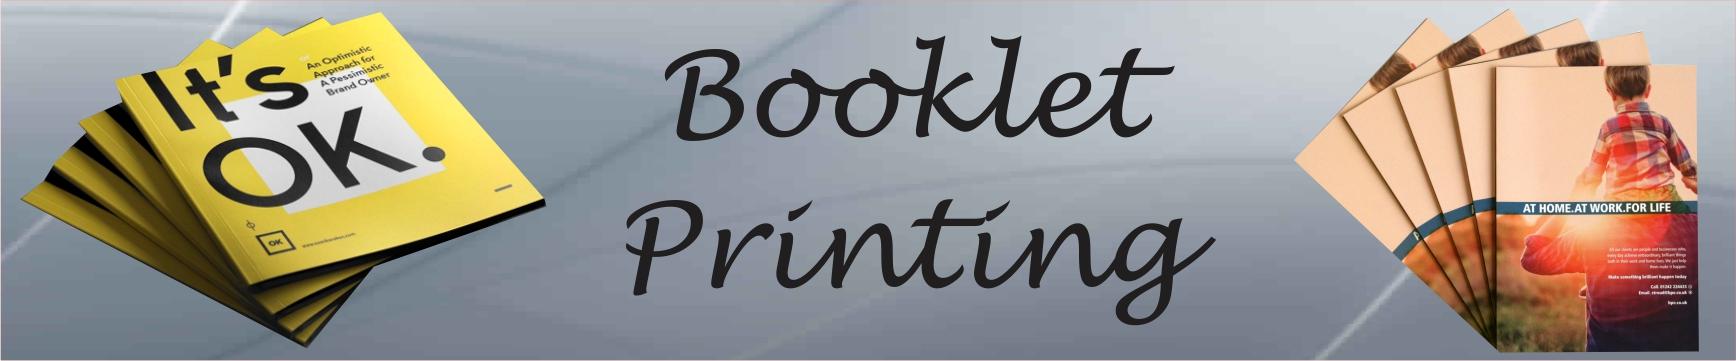 Best Booklet Printing Services In Delhi NCR   Abhi Print